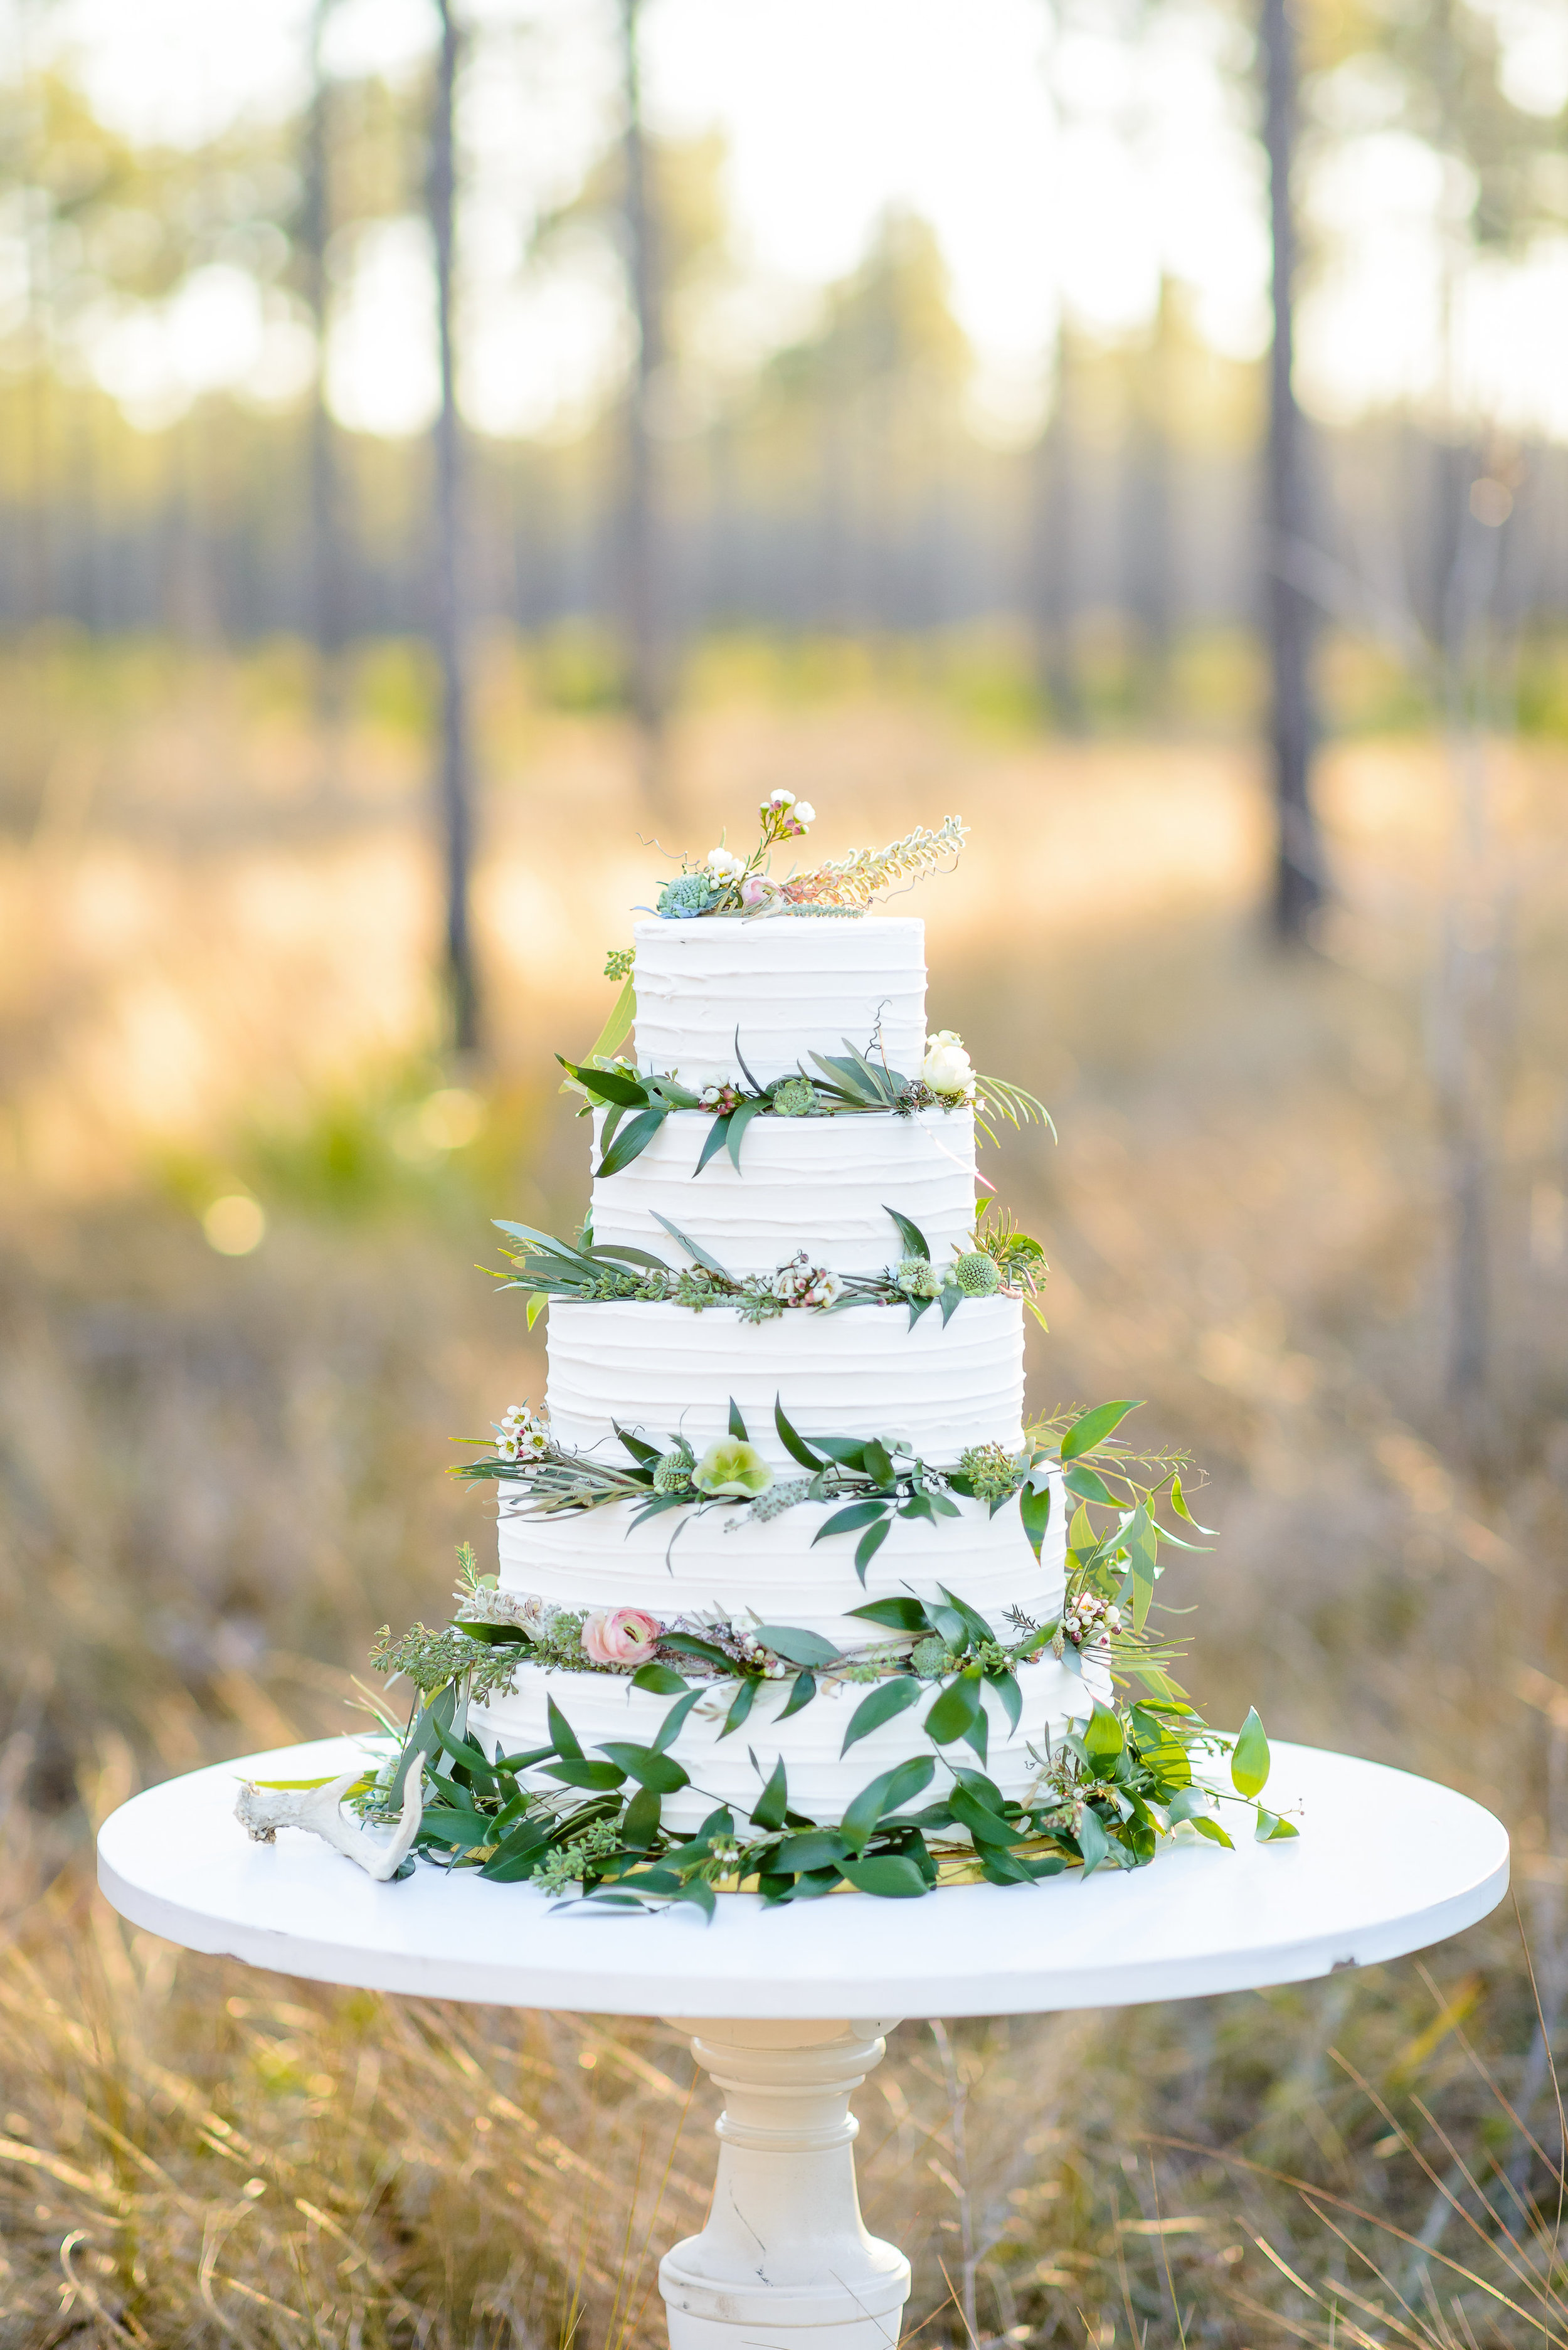 Beautiful Greenery Inspired Wedding Cake by Kakes by Katie